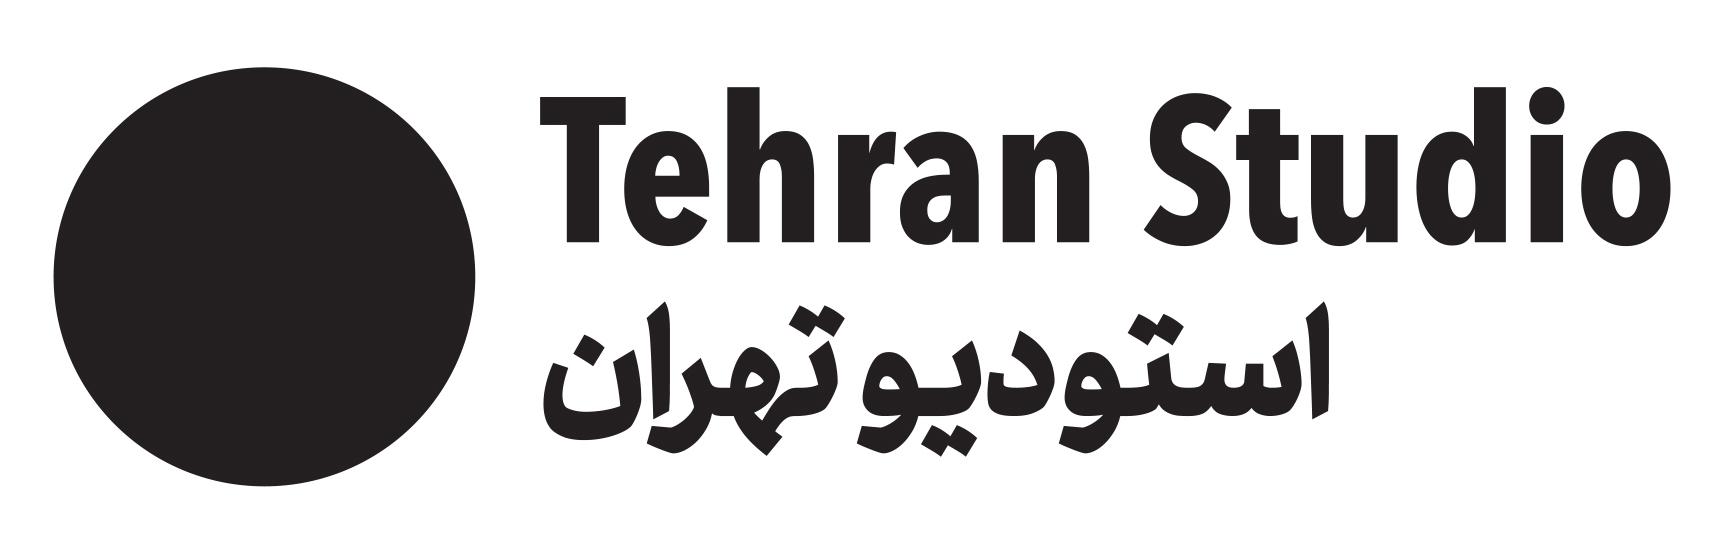 Tehran Studio | تهران استودیو